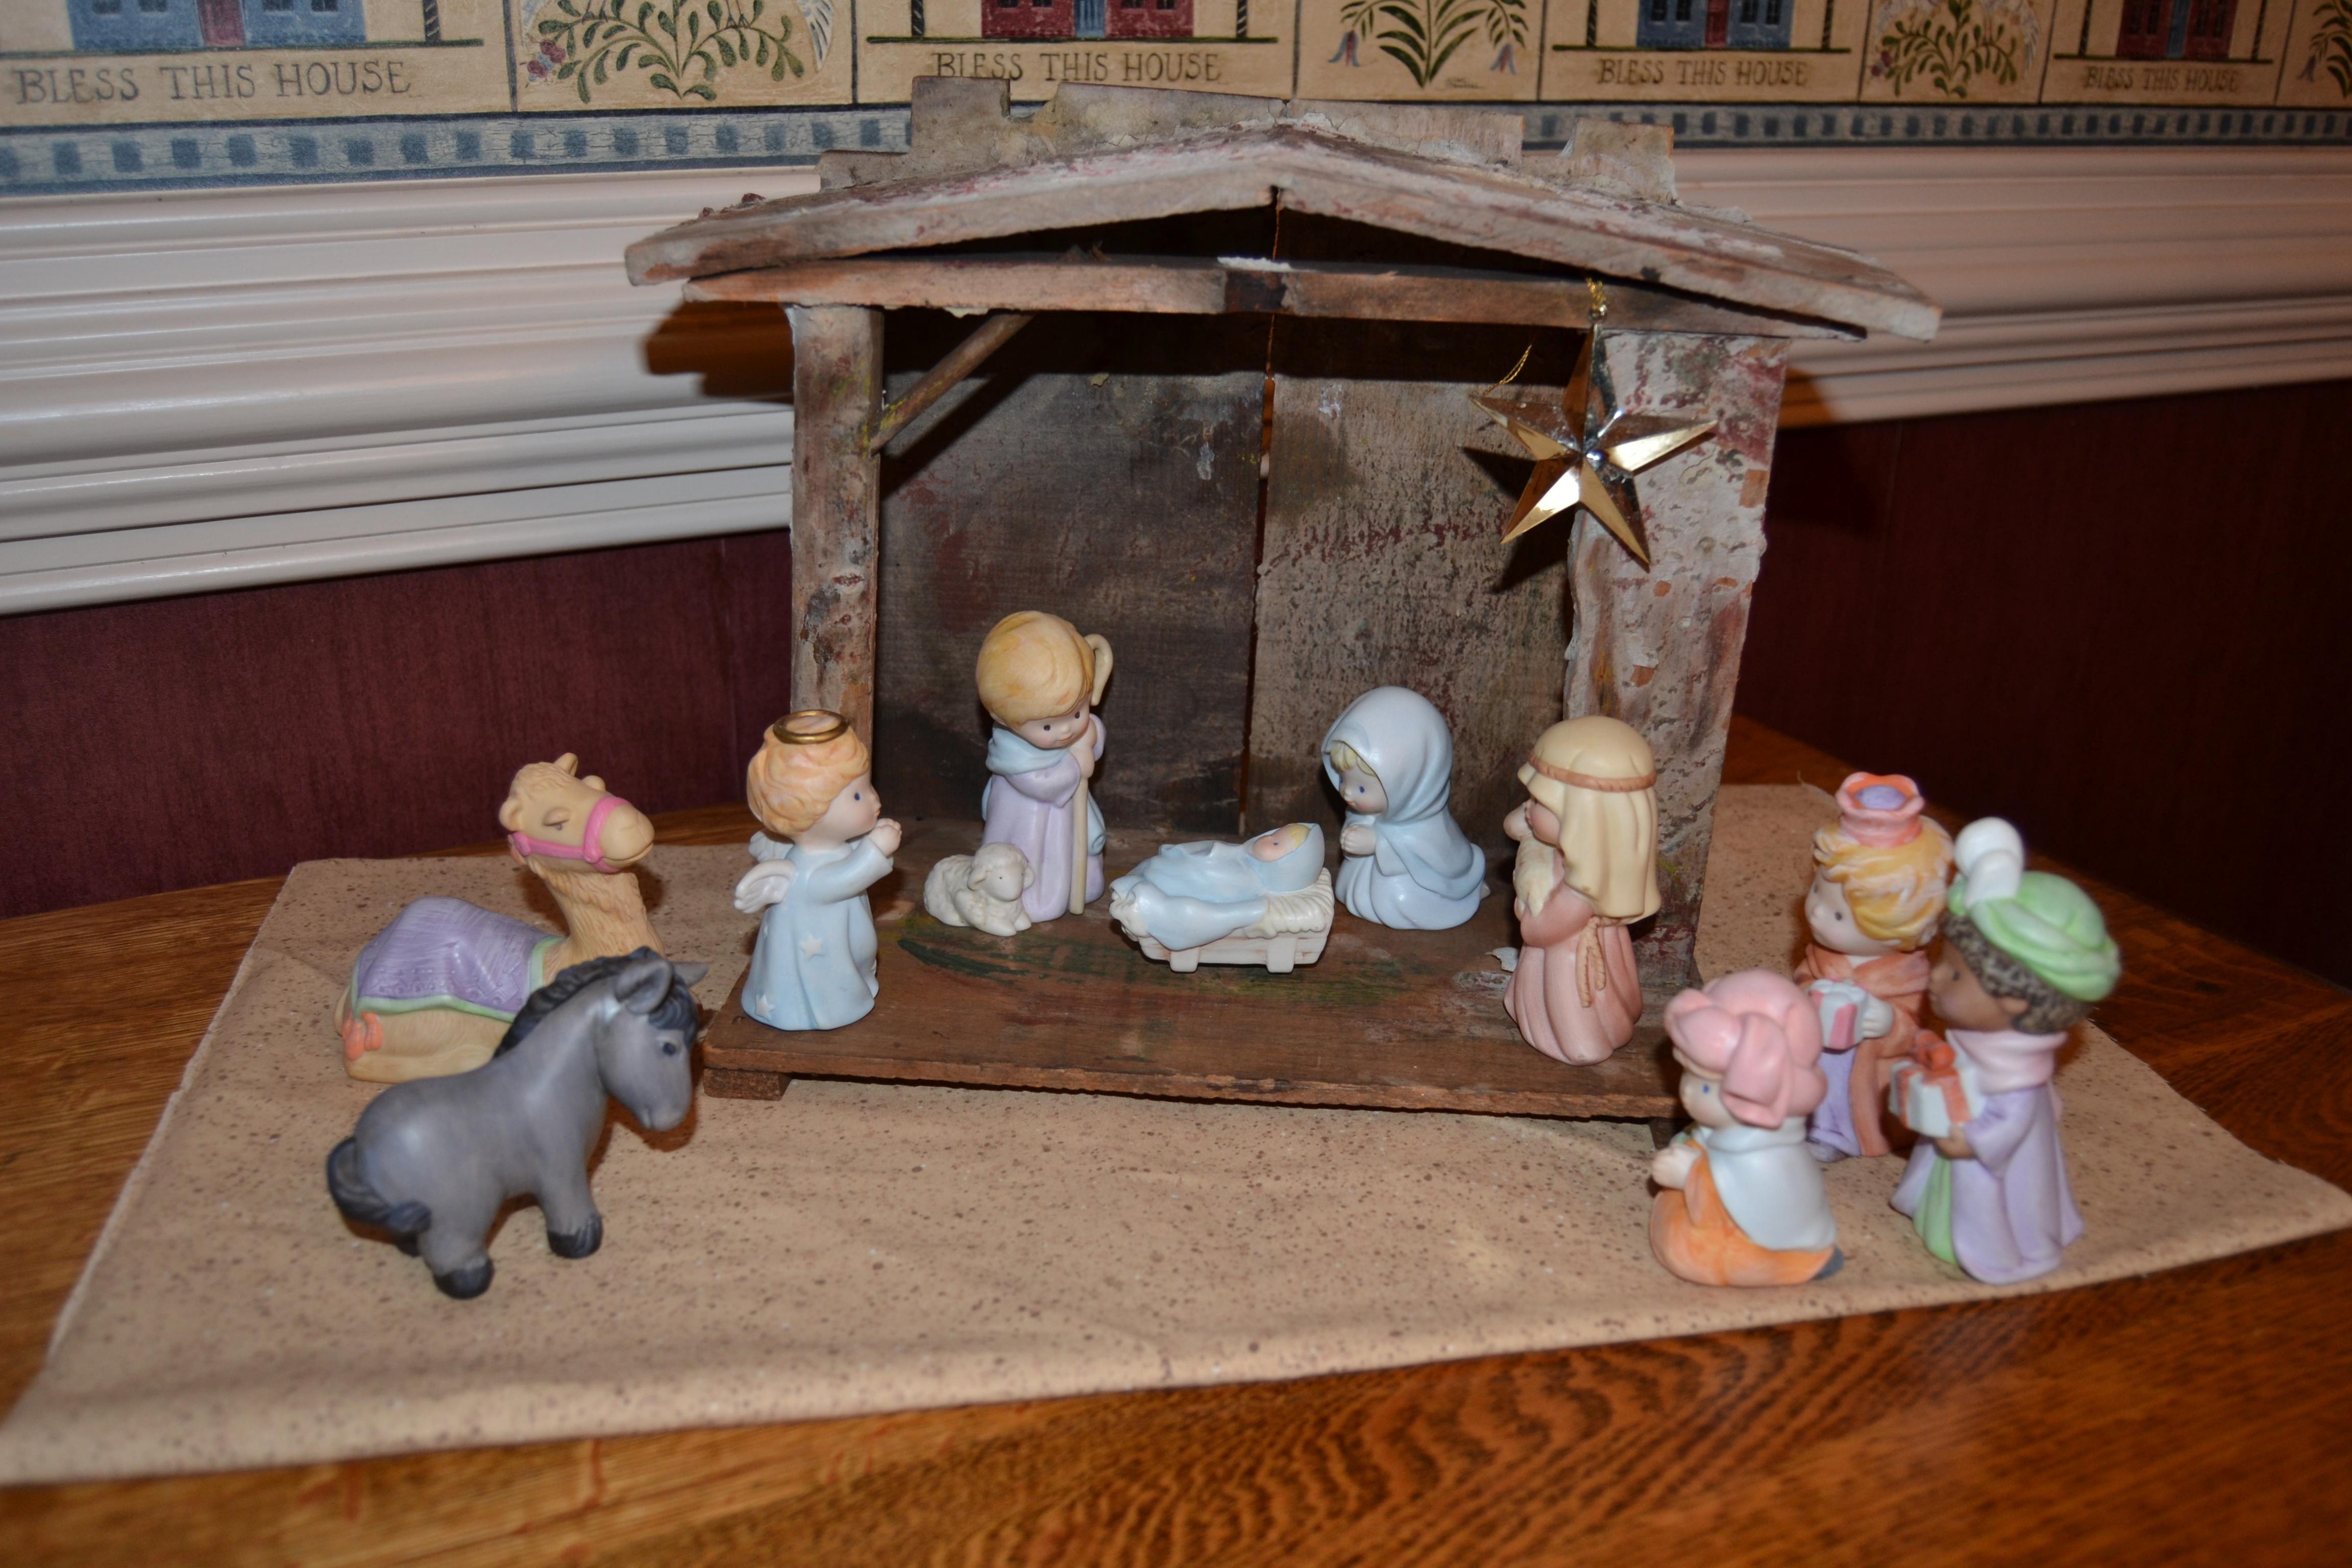 Simple Nativity Set Our nativity scene reflects my